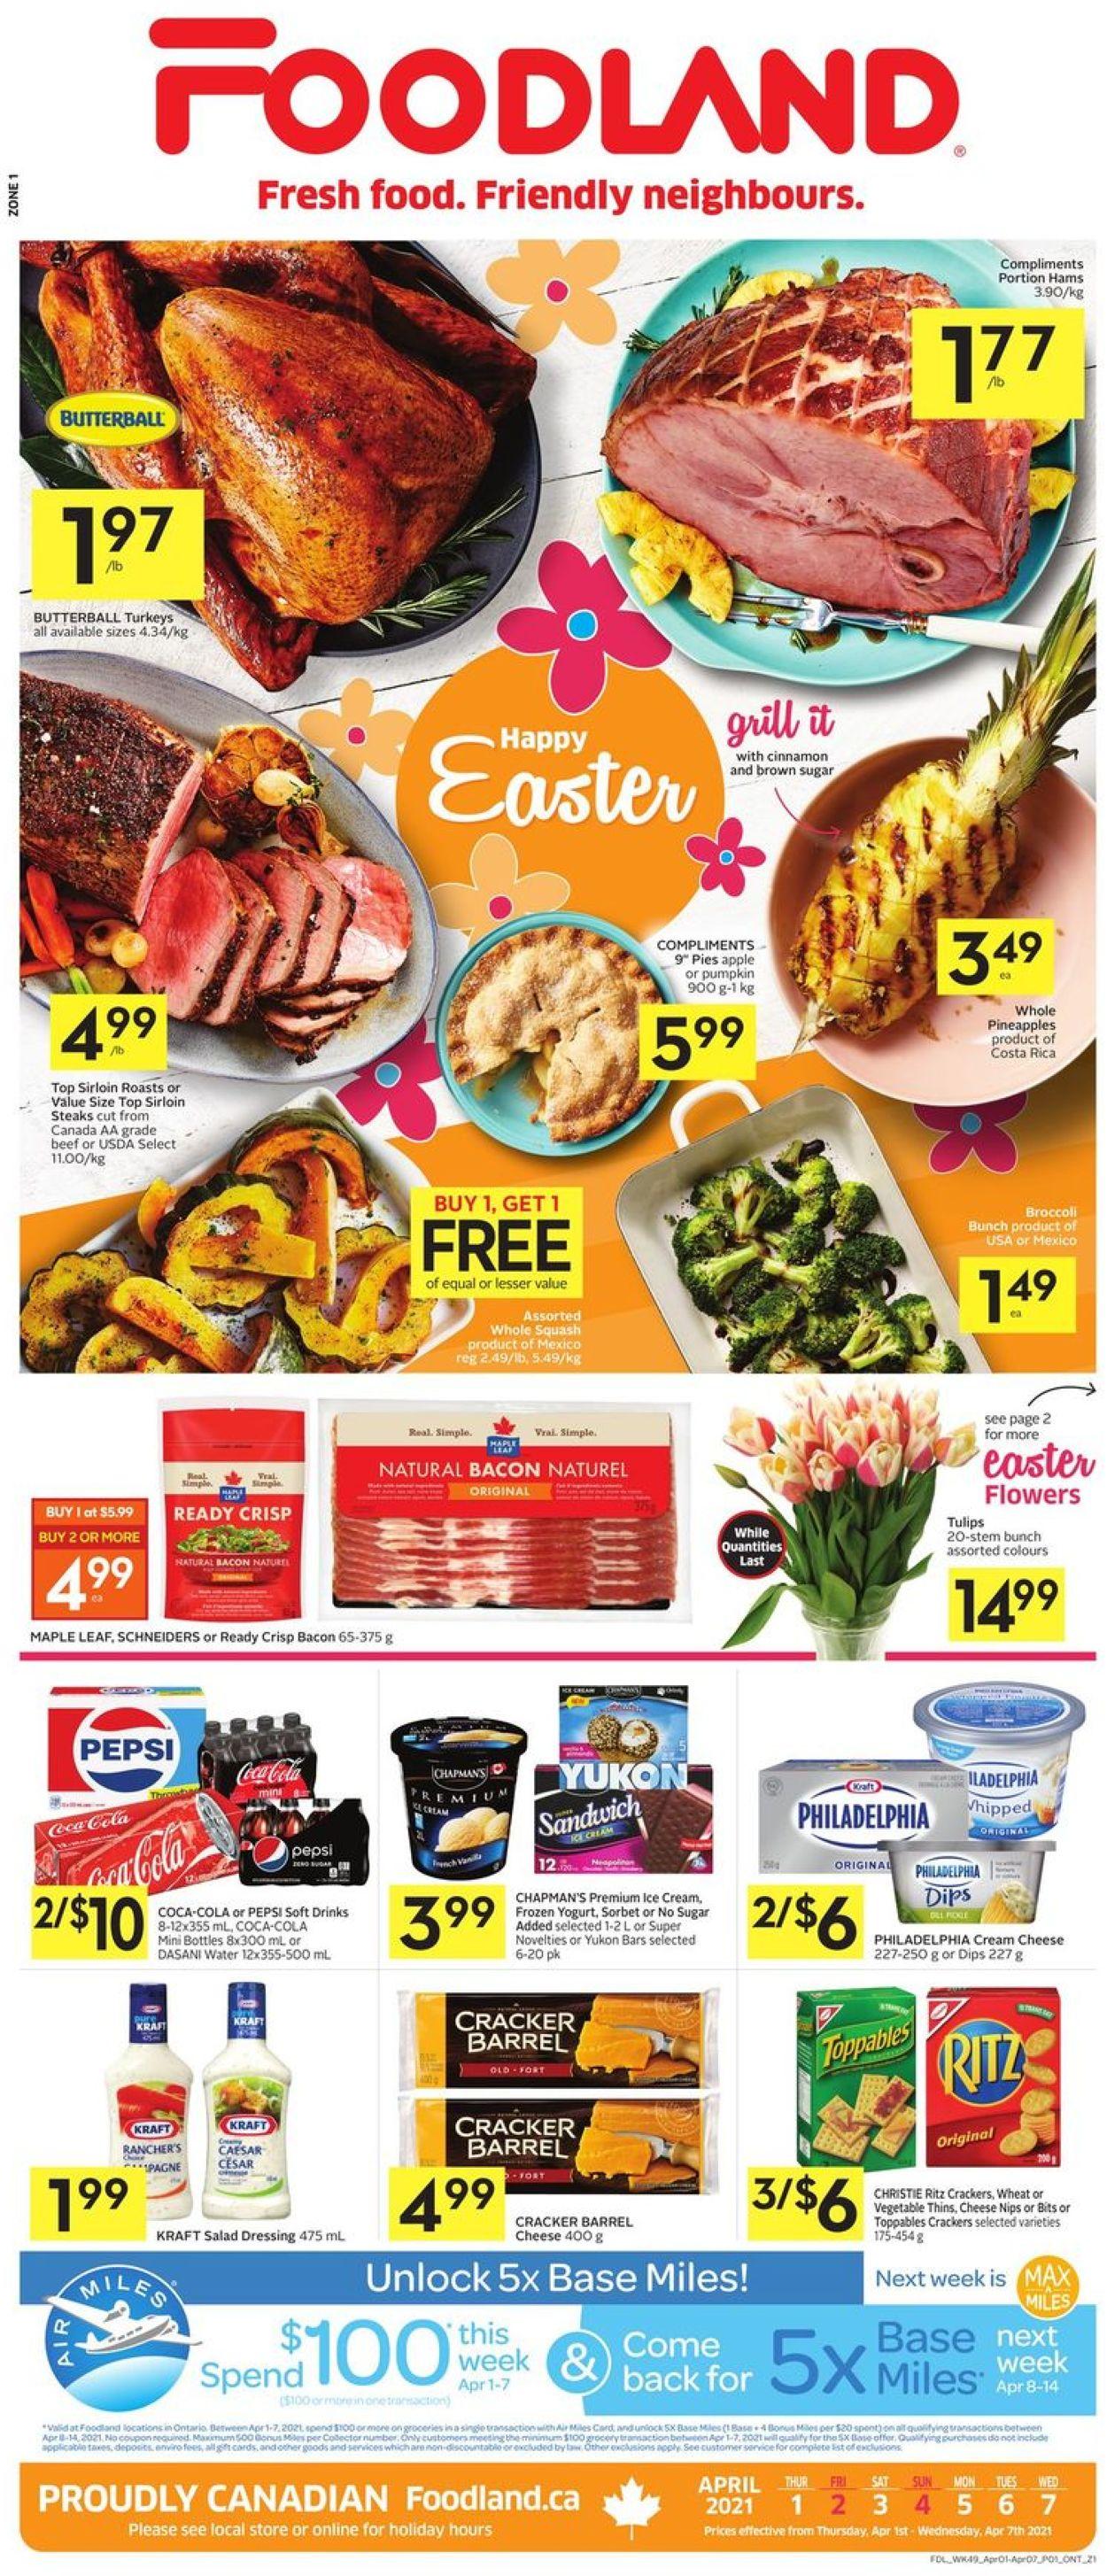 Foodland Flyer - 04/01-04/07/2021